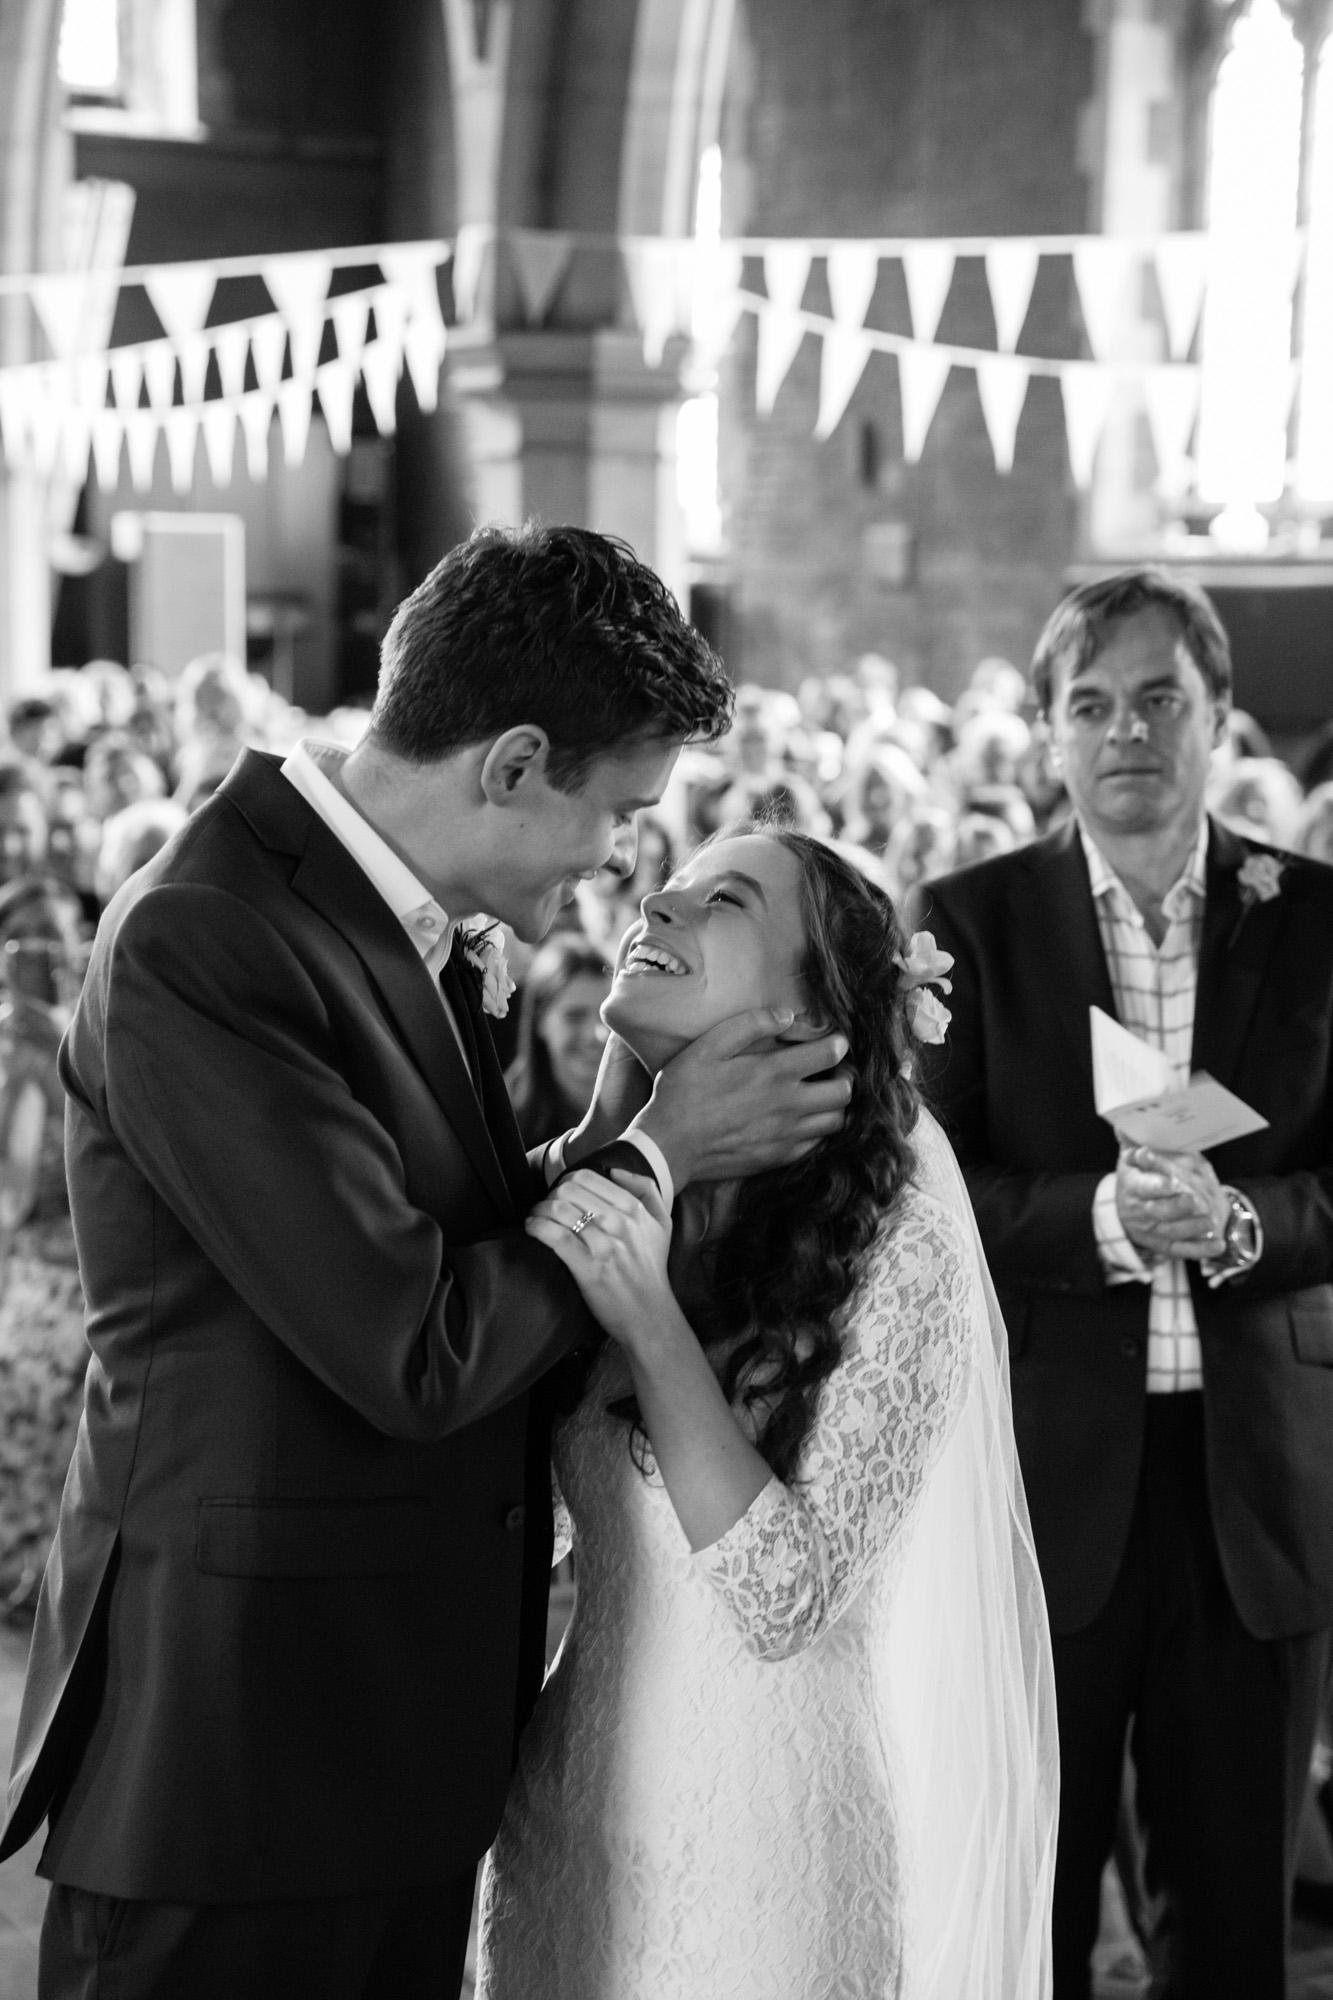 weddings-couples-love-photographer-oxford-london-jonathan-self-photography-34.jpg